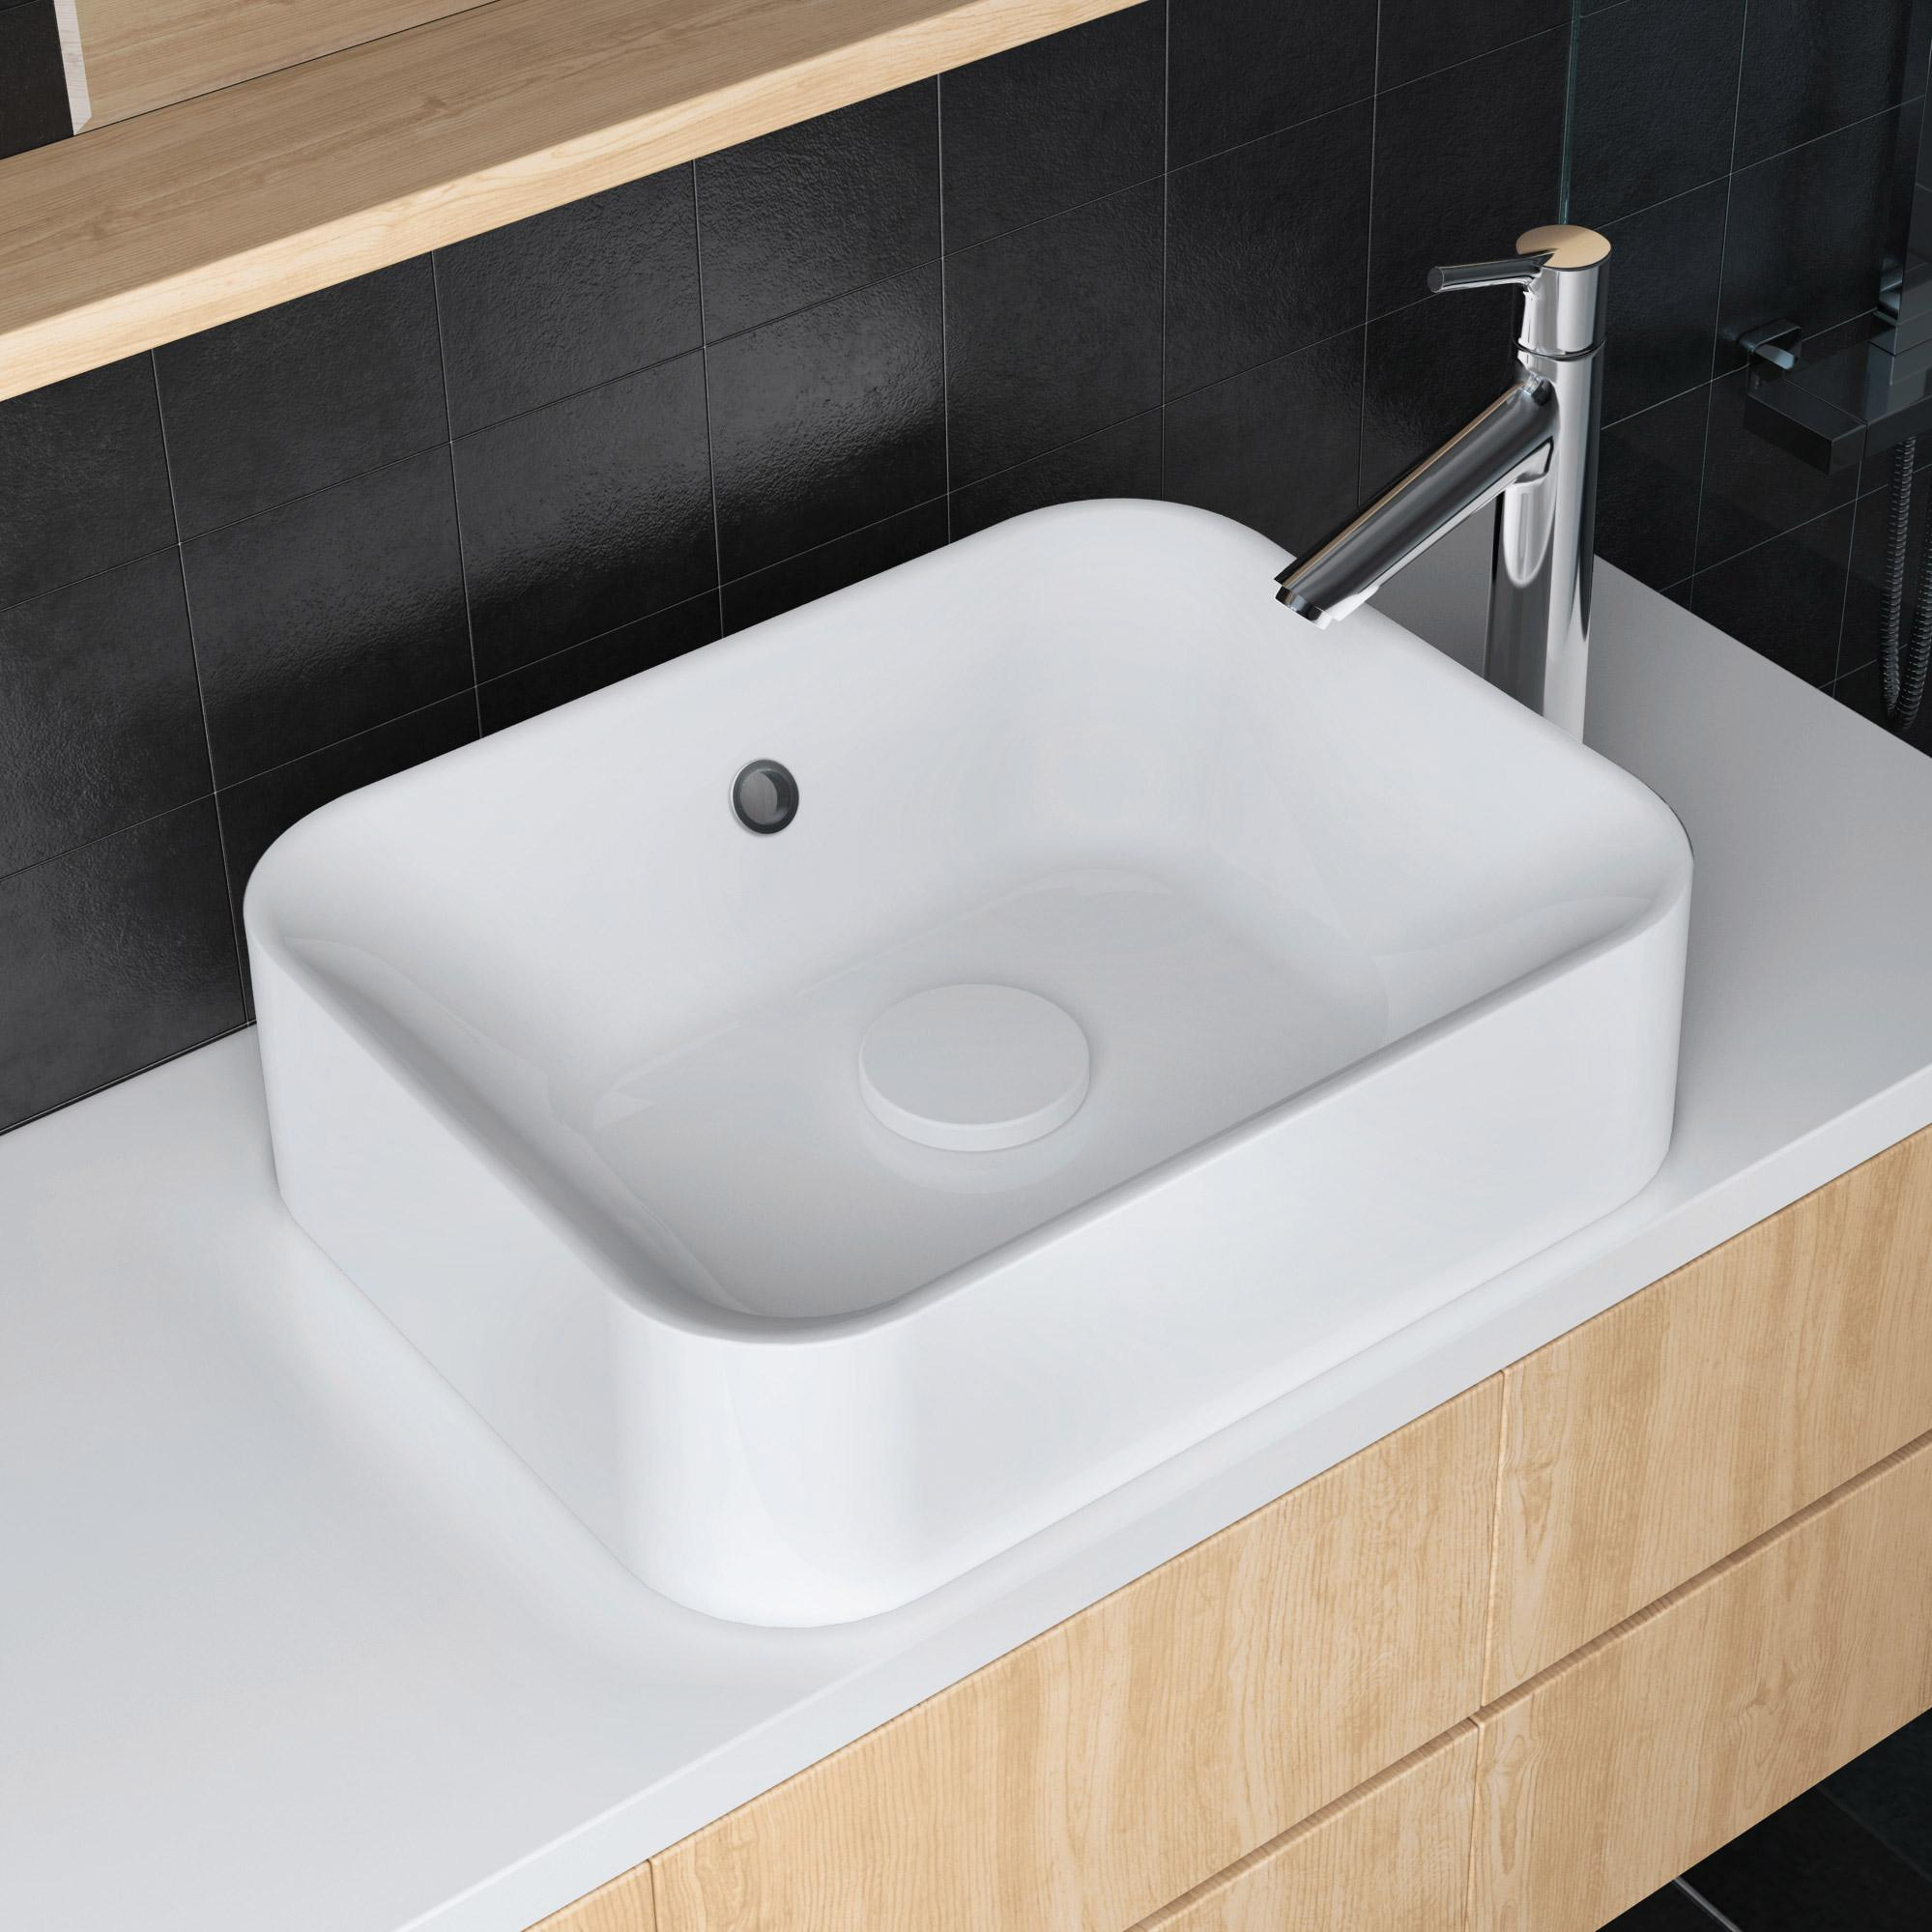 Vasque à poser rectangulaire résine l.48 x P.38 cm blanc Capsule